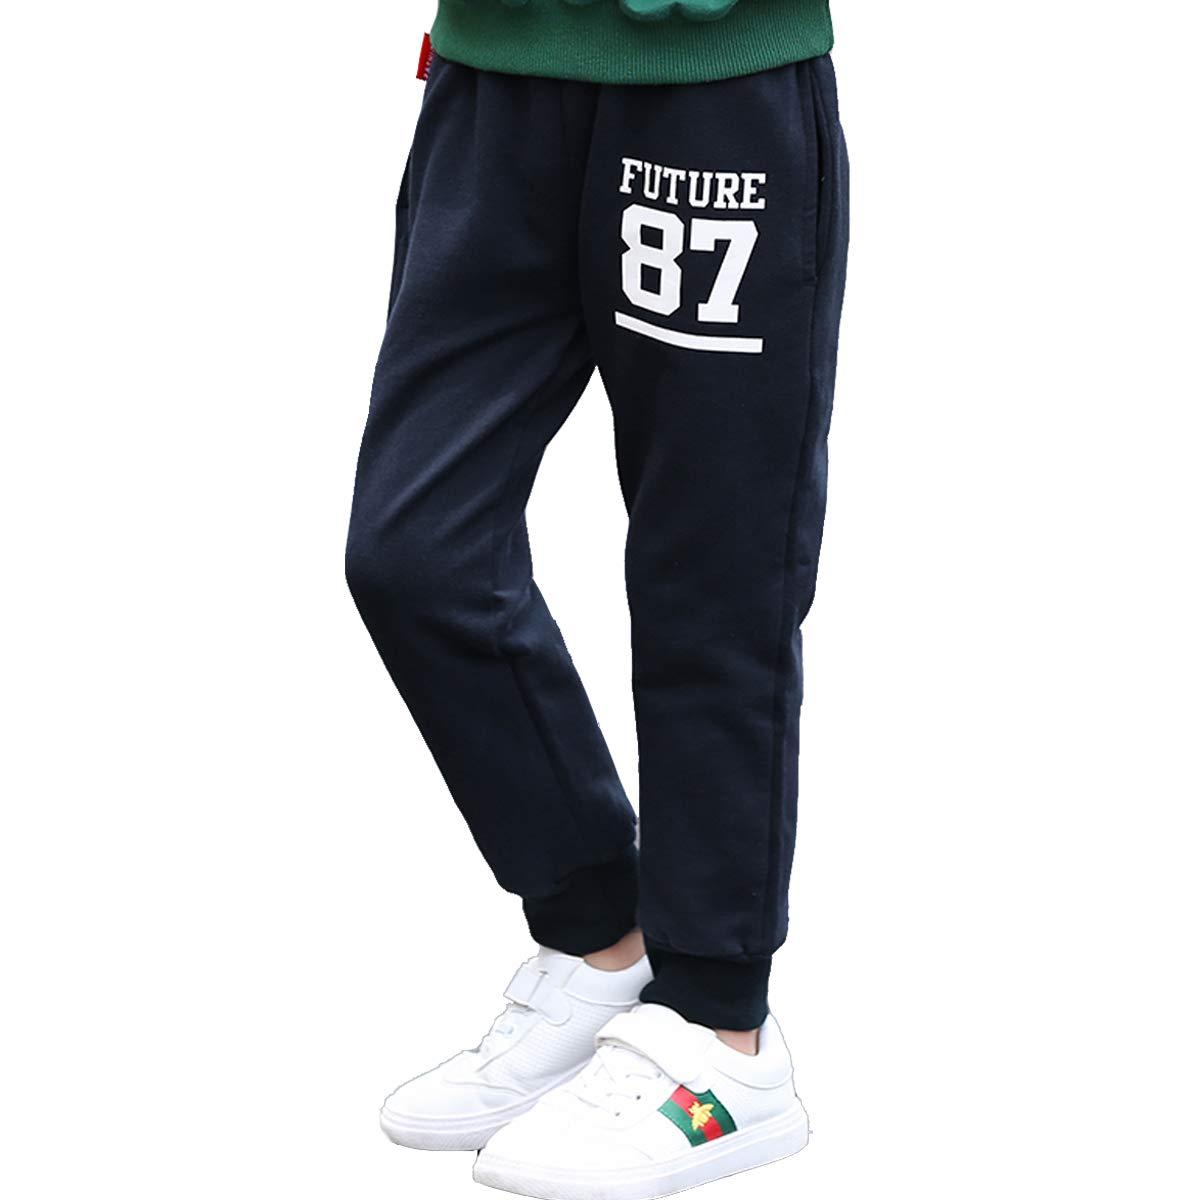 OnlyAngel Kids Boys Sports Pants Black Cotton Elastic Waist Leisure Trousers Age 3-10